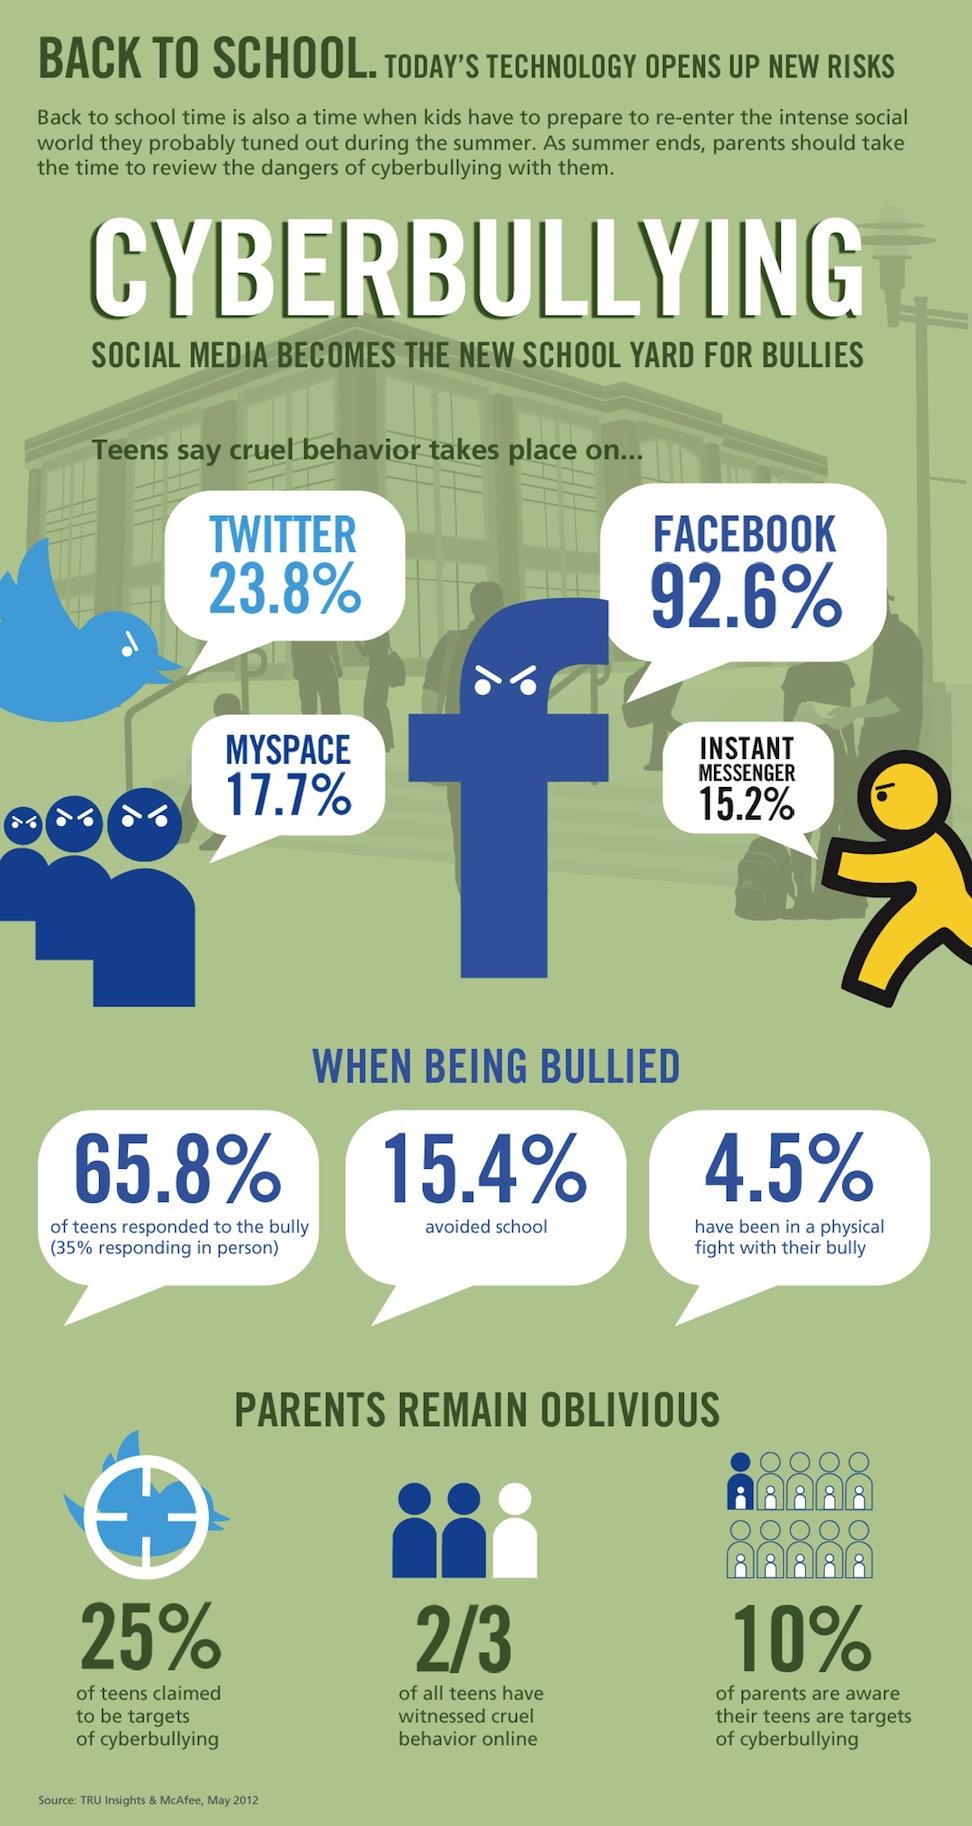 back to school  cyberbullying  u2013 social media becomes the new school yard for bullies